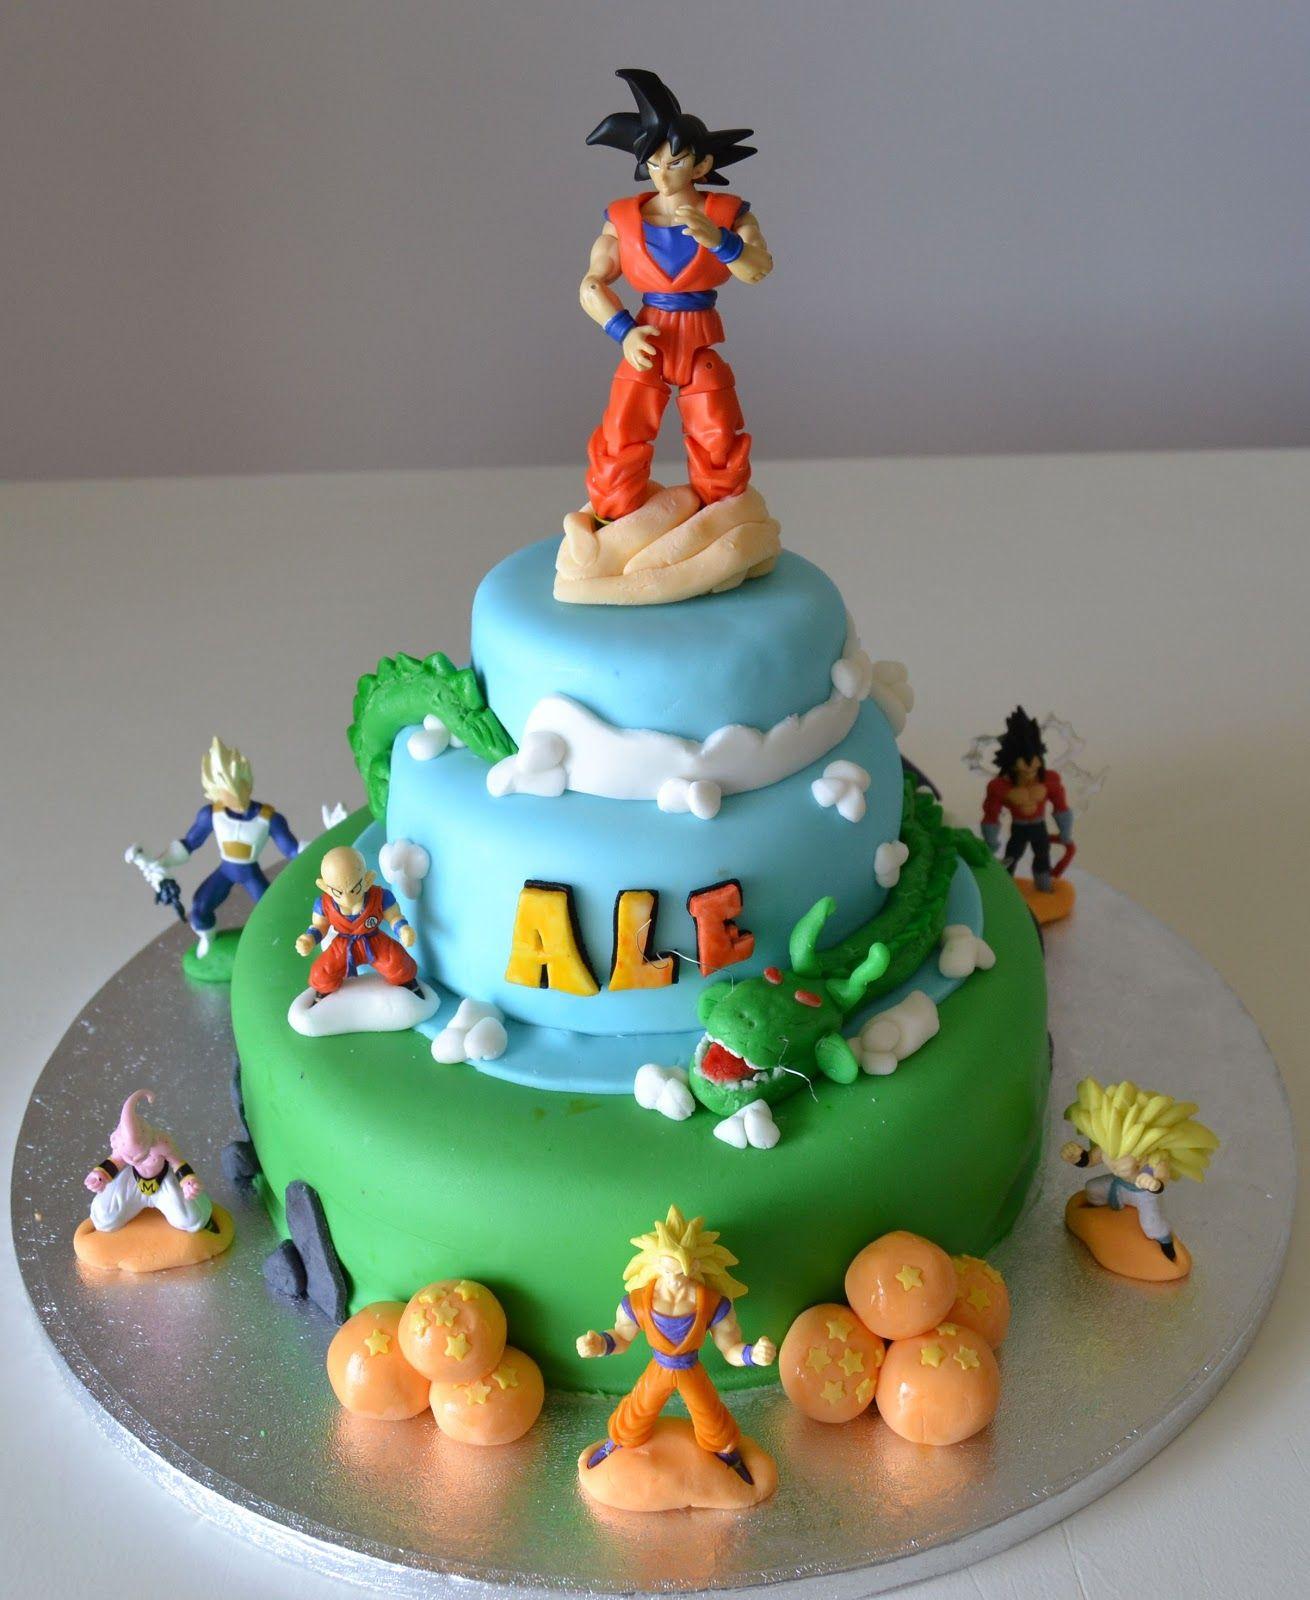 Delanas Cakes Dragon Ball Z Cake Dragon Ball Z Cakes Pinterest